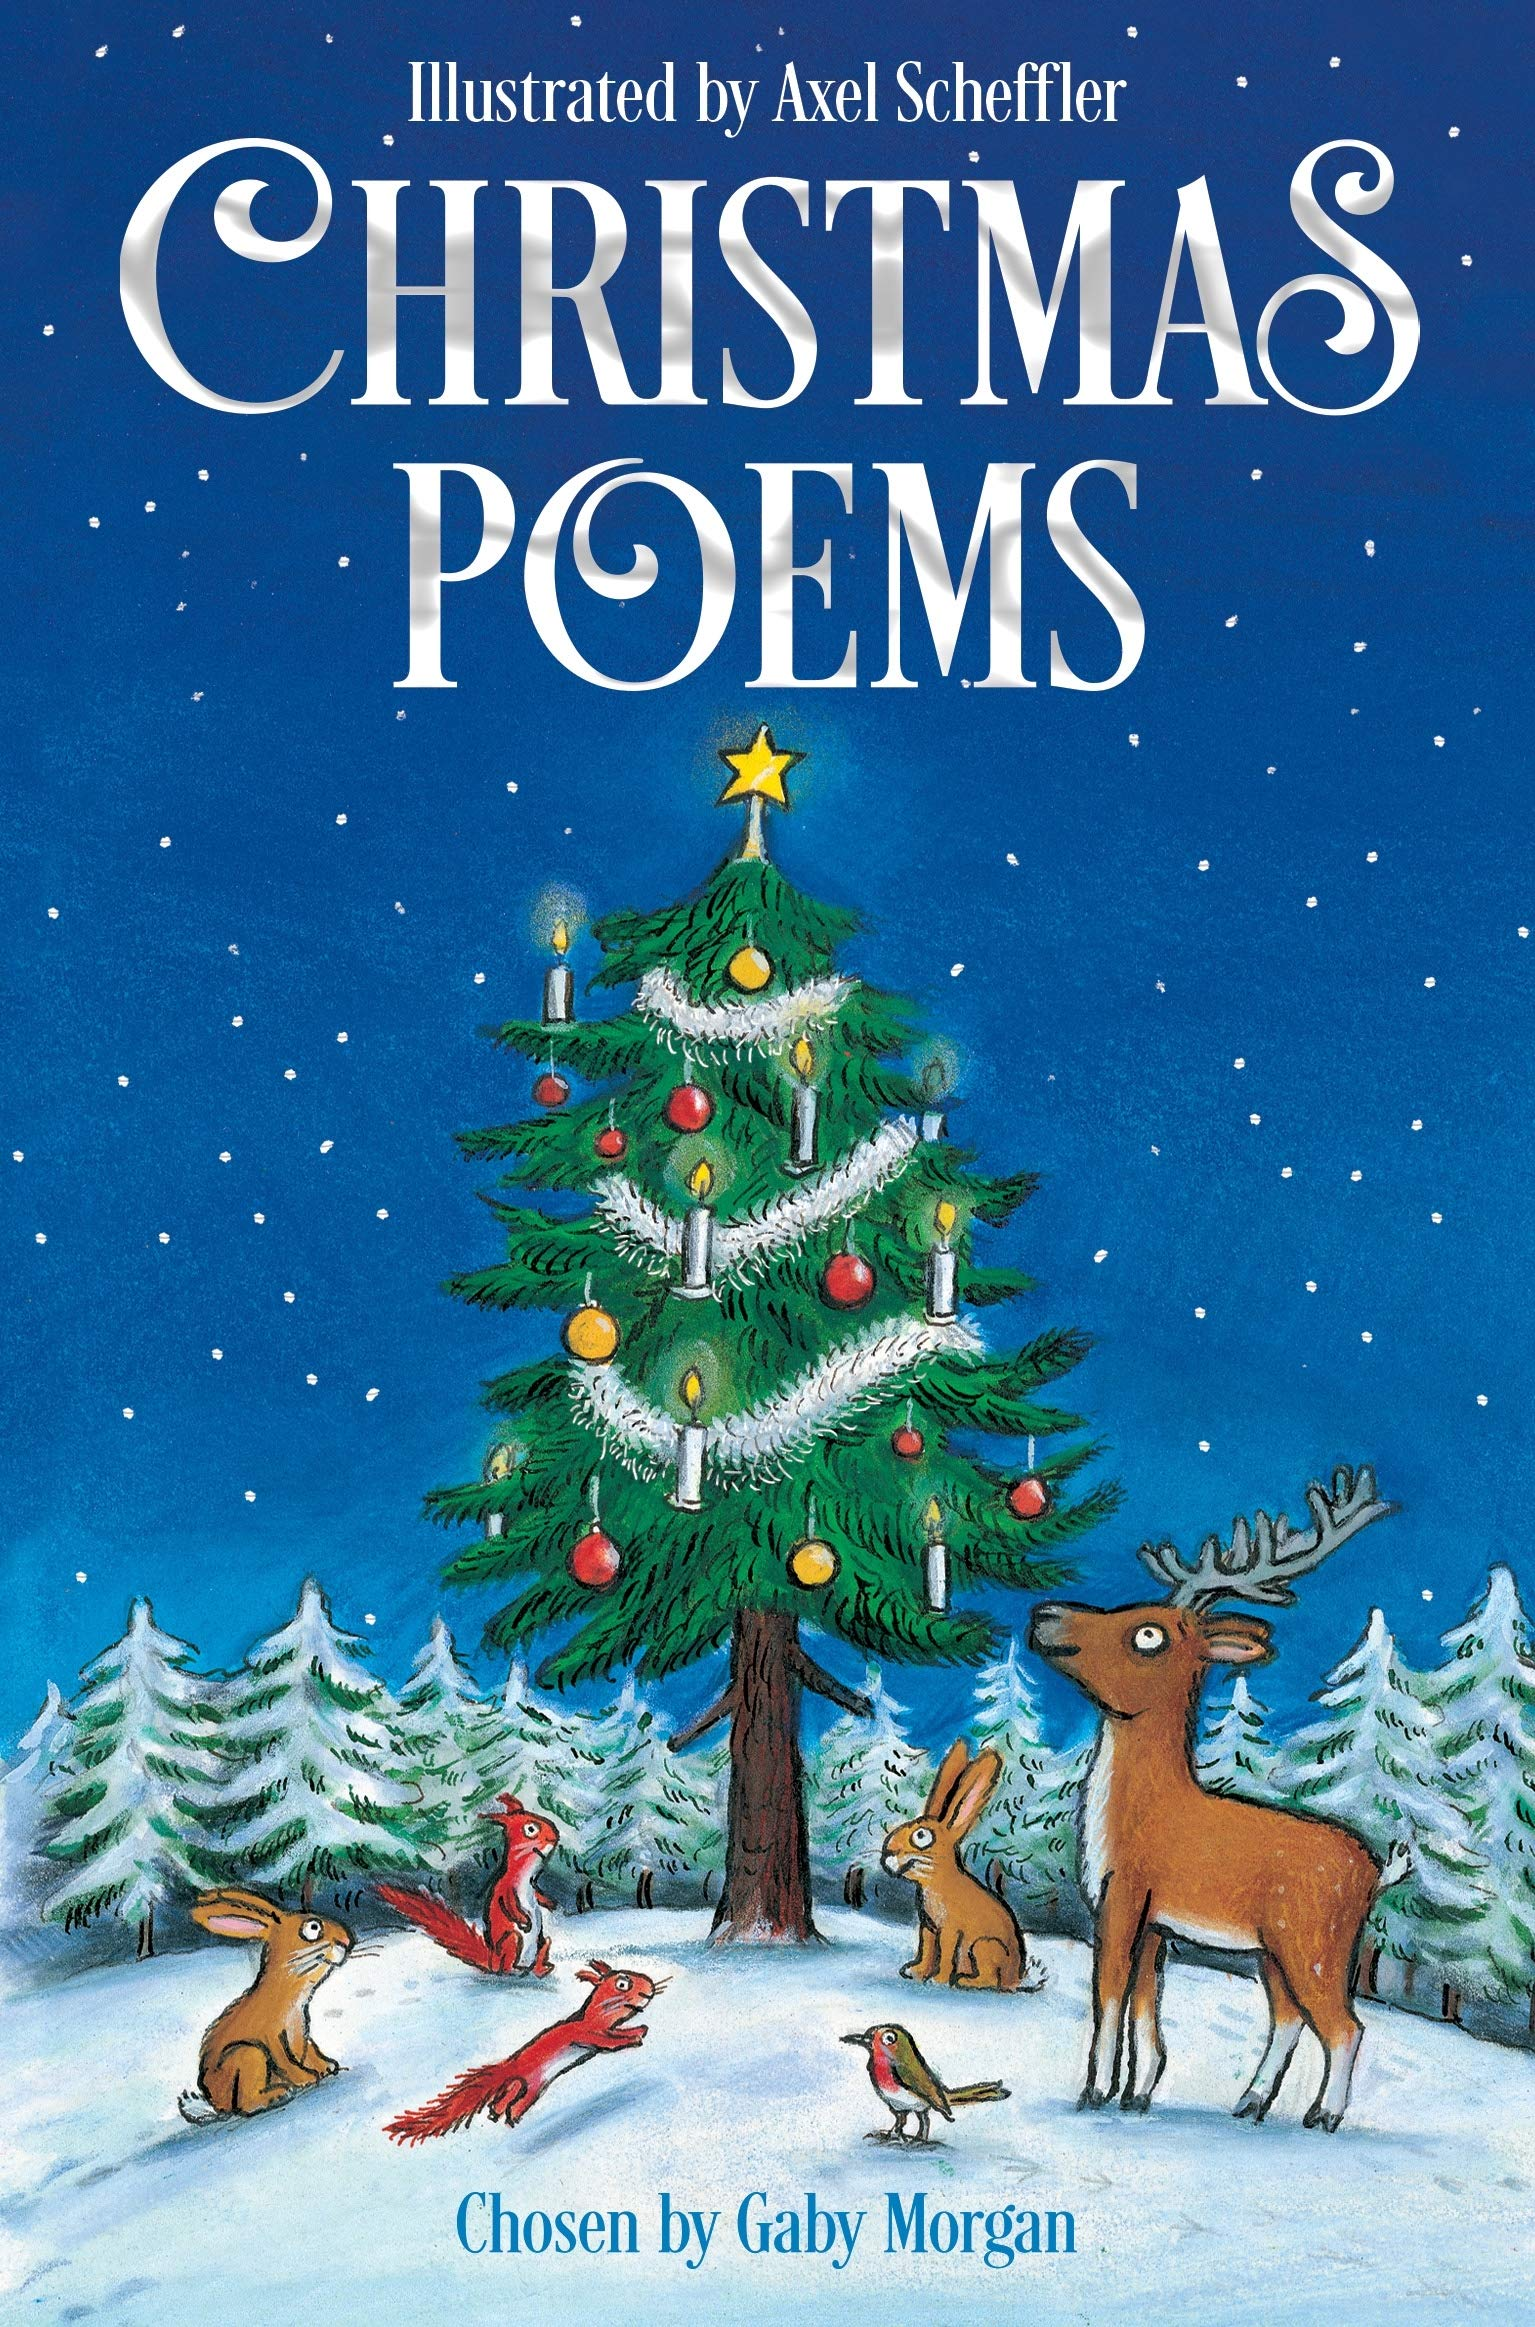 Christmas Poems: Amazon.co.uk: Morgan, Gaby, Scheffler, Axel:  9781529024395: Books